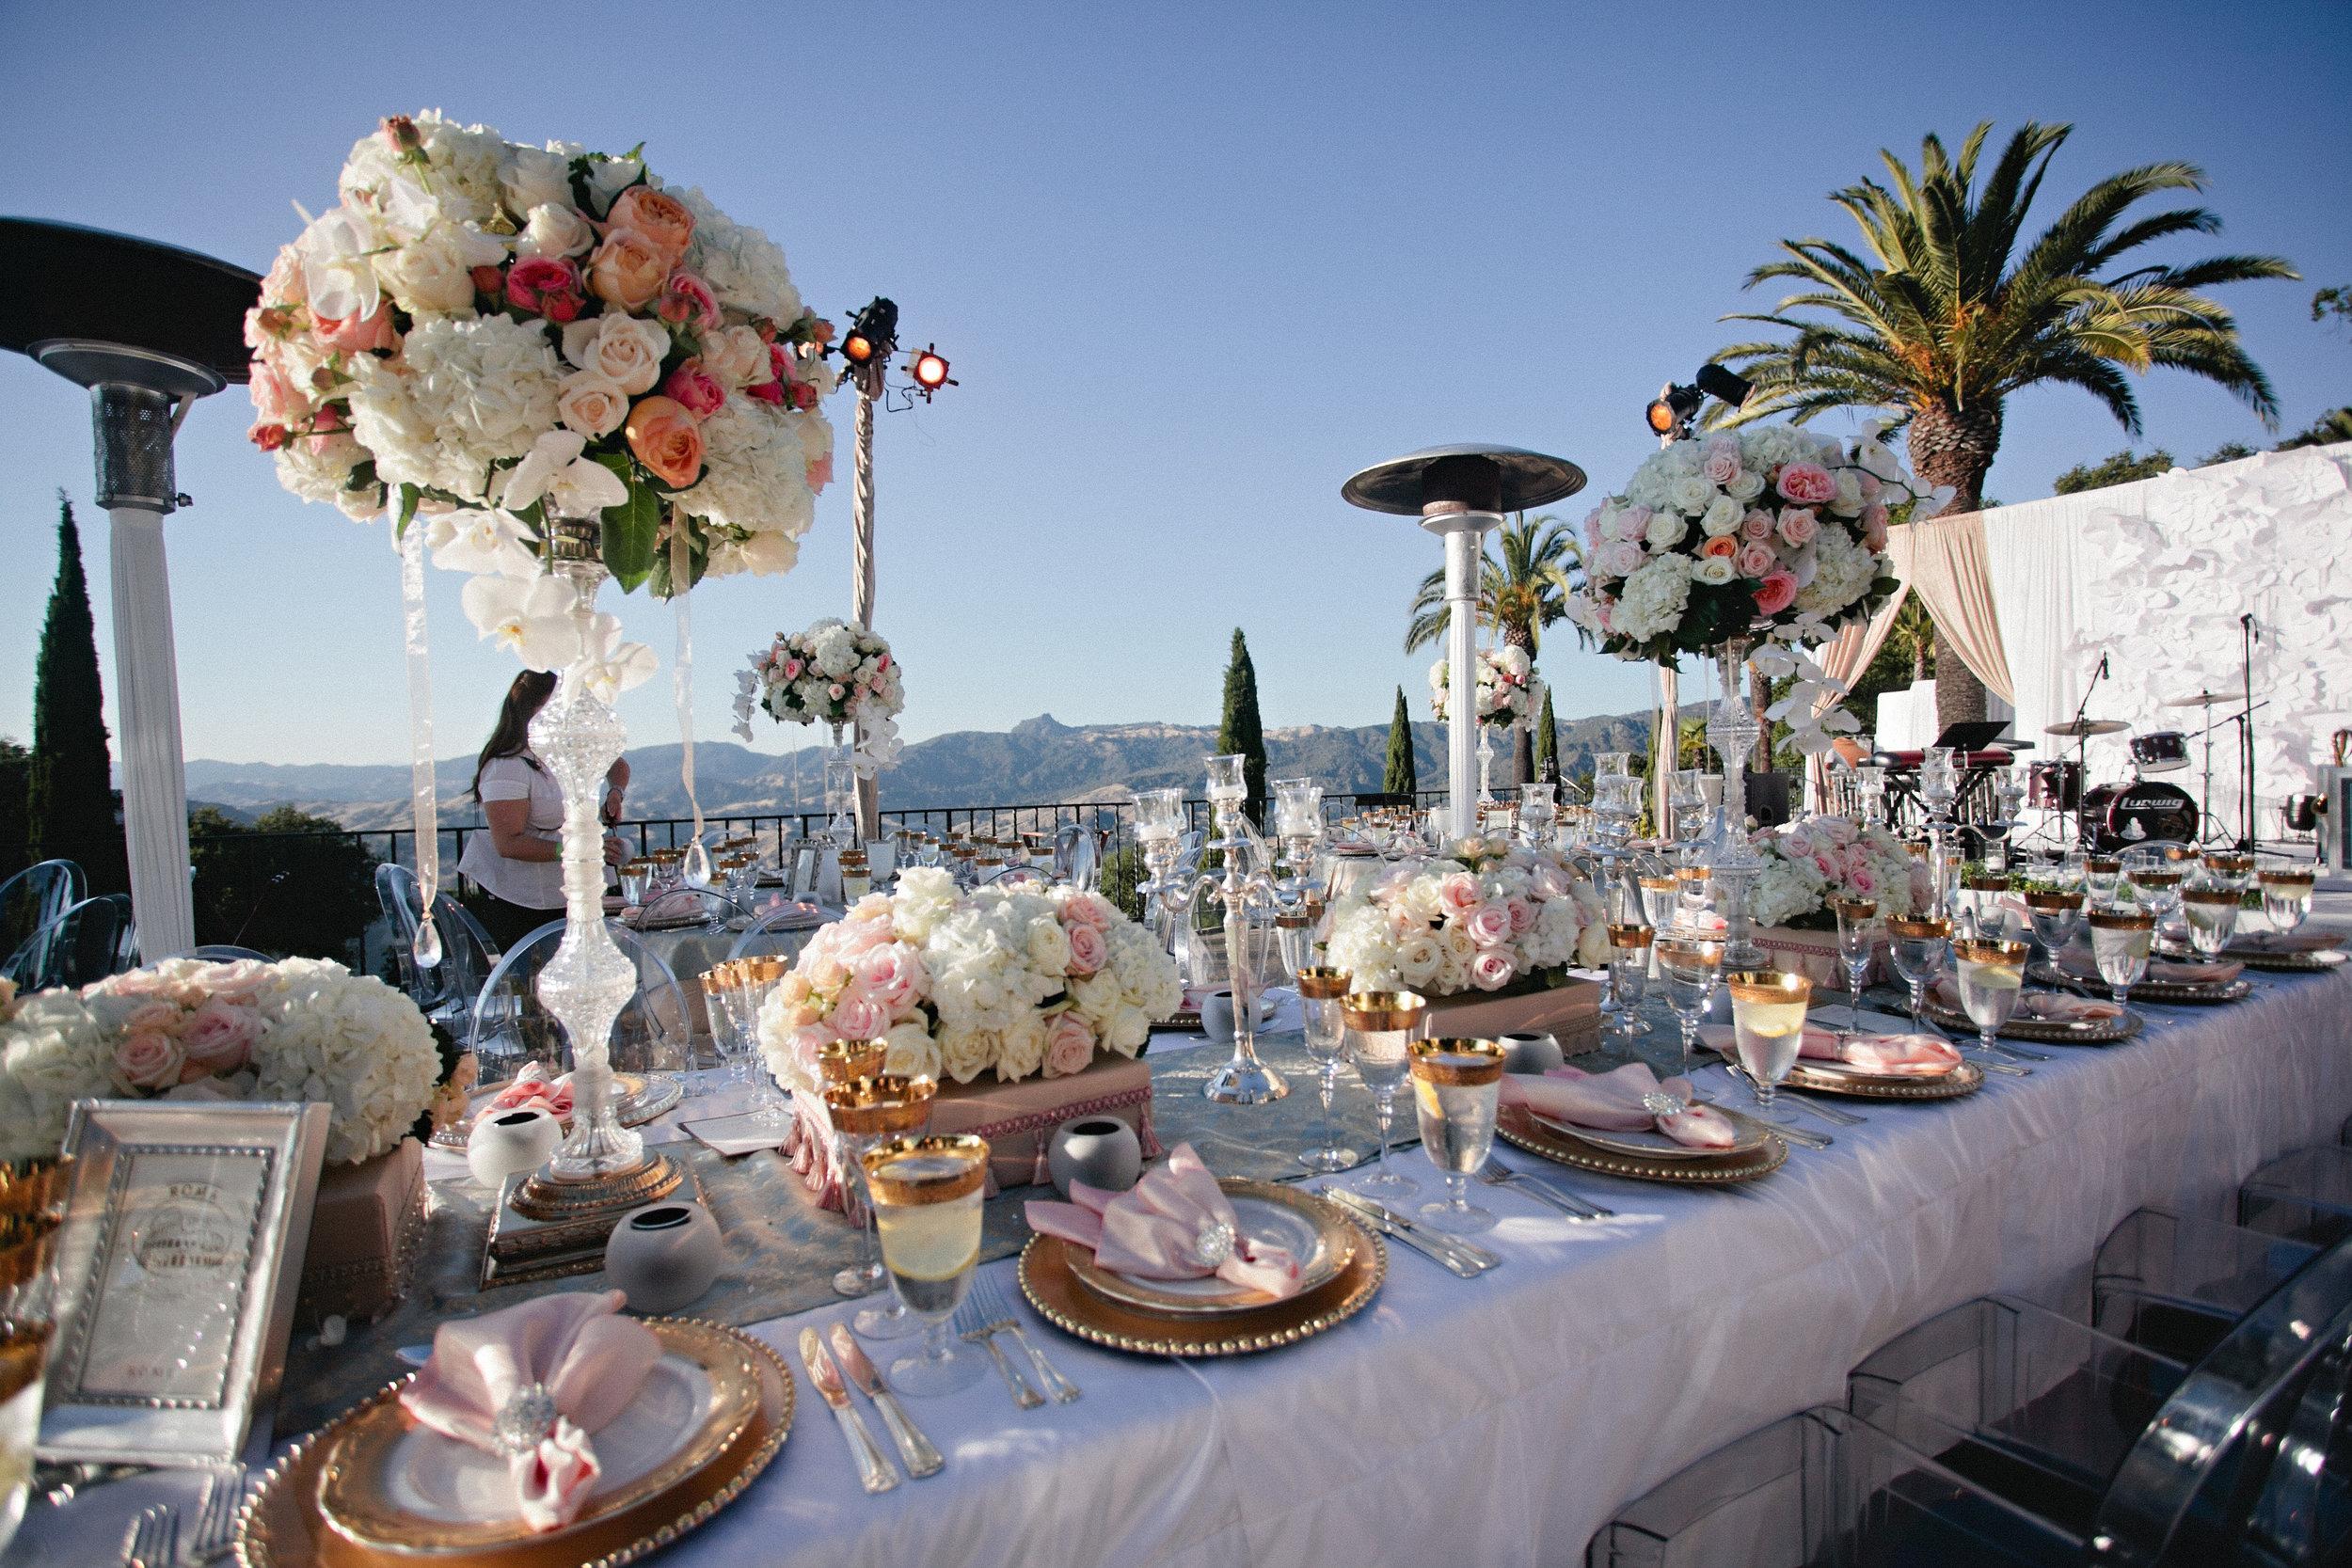 9169_linda_vu_wedding-1616996698-O.jpg